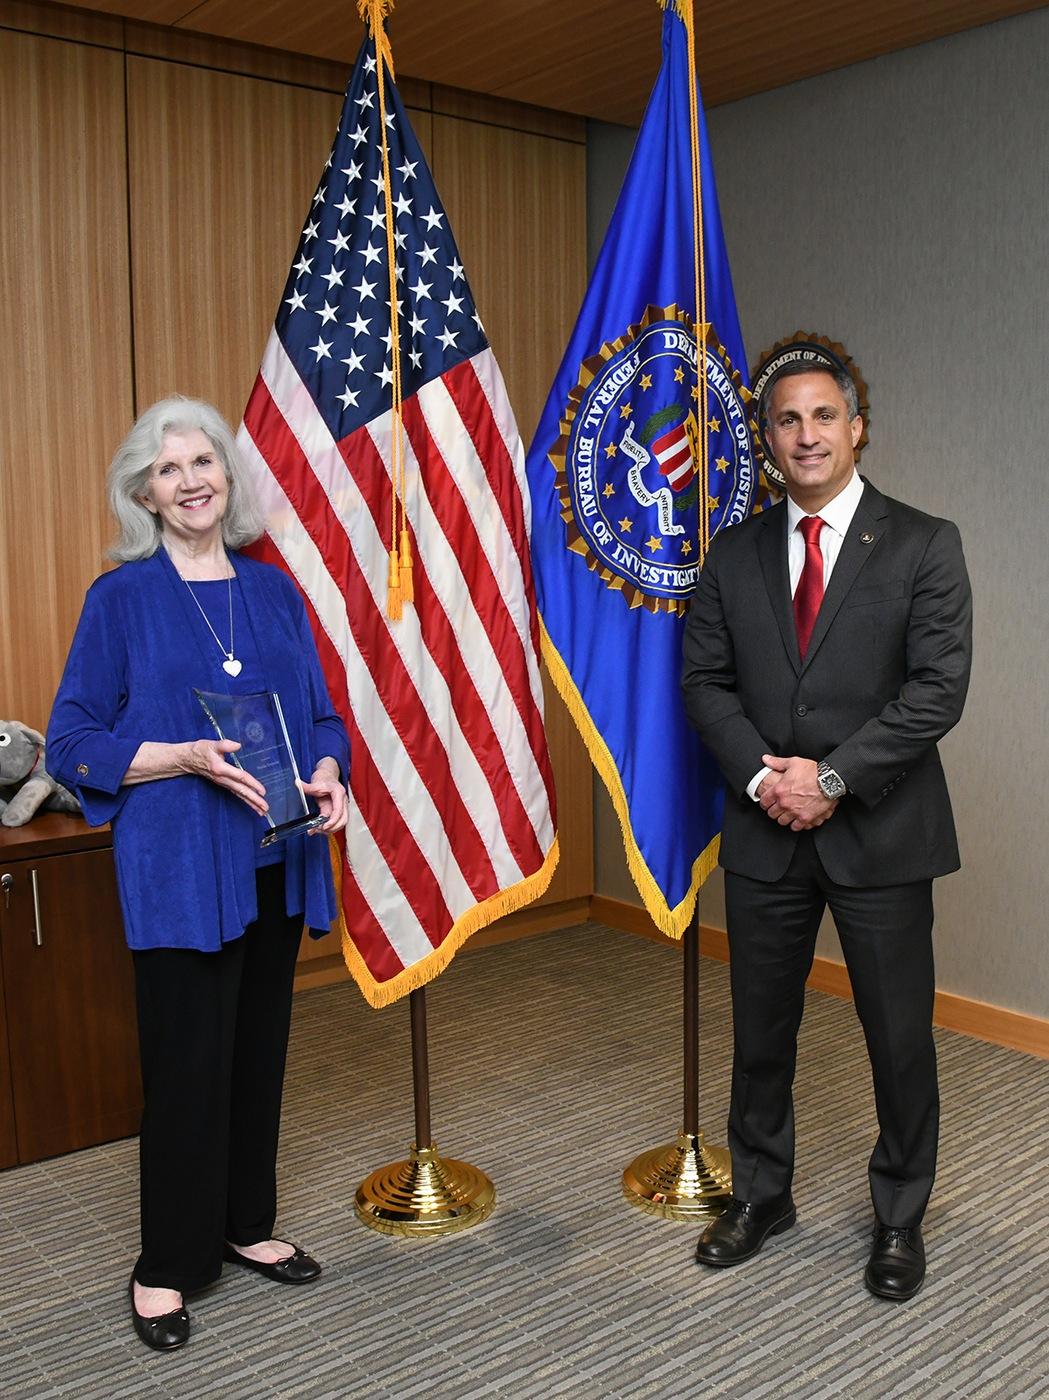 FBI Boston Director's Community Leadership Award recipient Sheila Duncan poses with Boston Special Agent in Charge Joseph Bonavolonta.